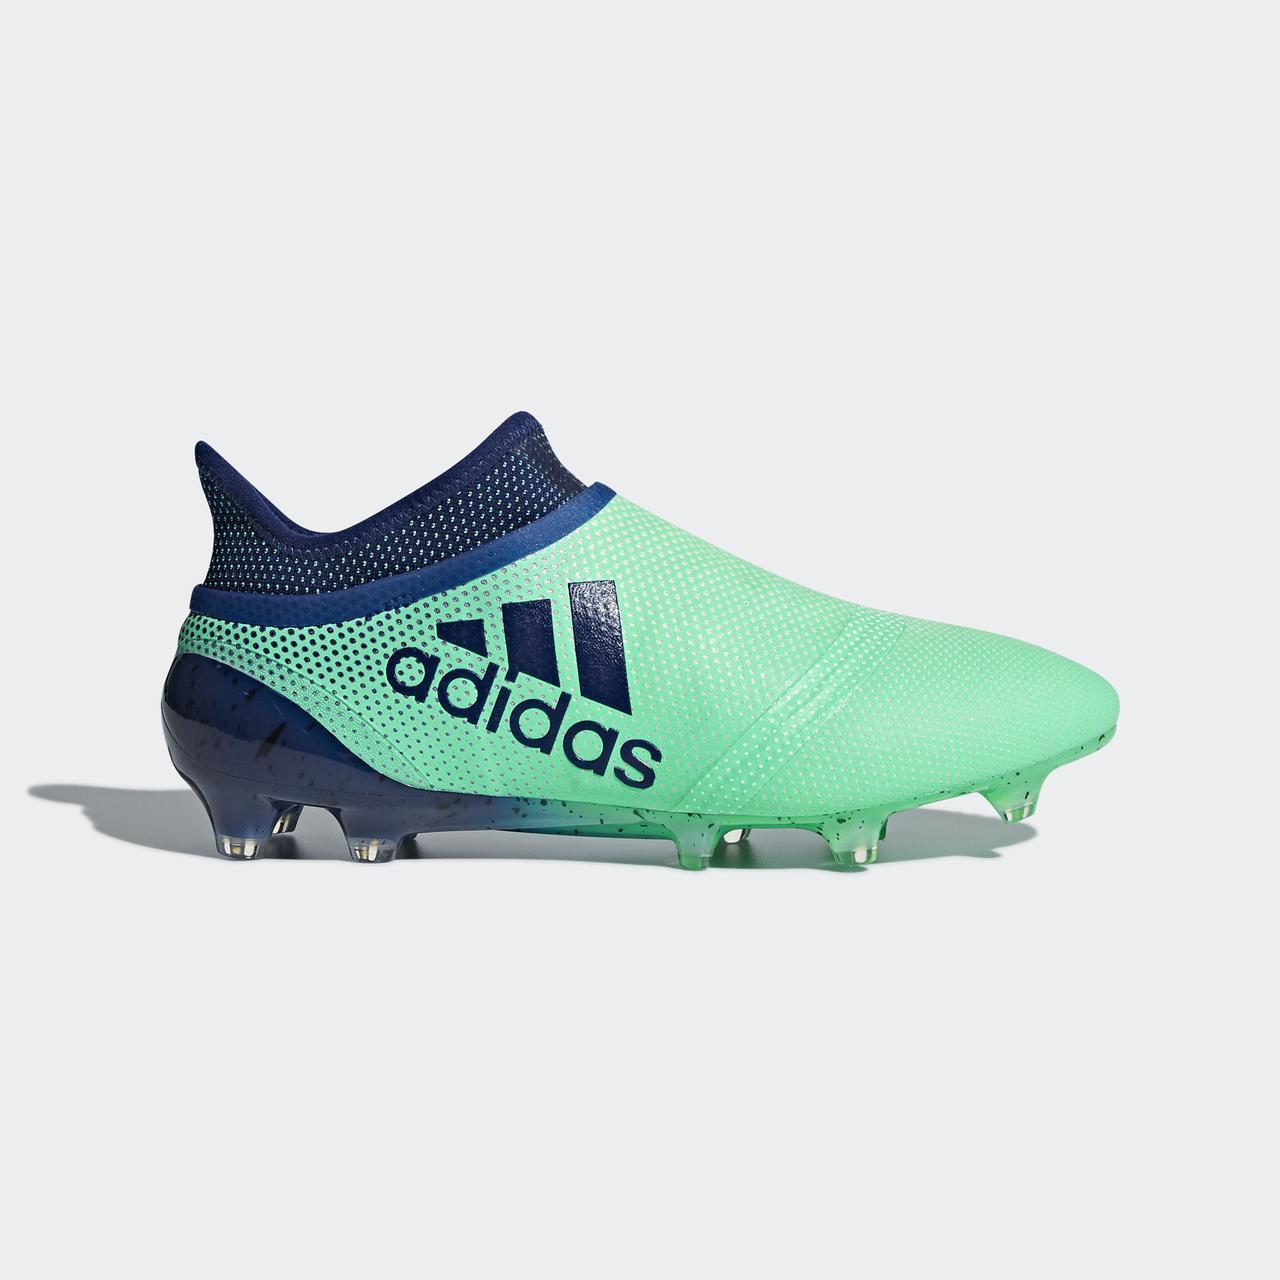 c69c9d5f Футбольные бутсы Adidas Performance X 17+ Purespeed FG (Артикул: CM7713)